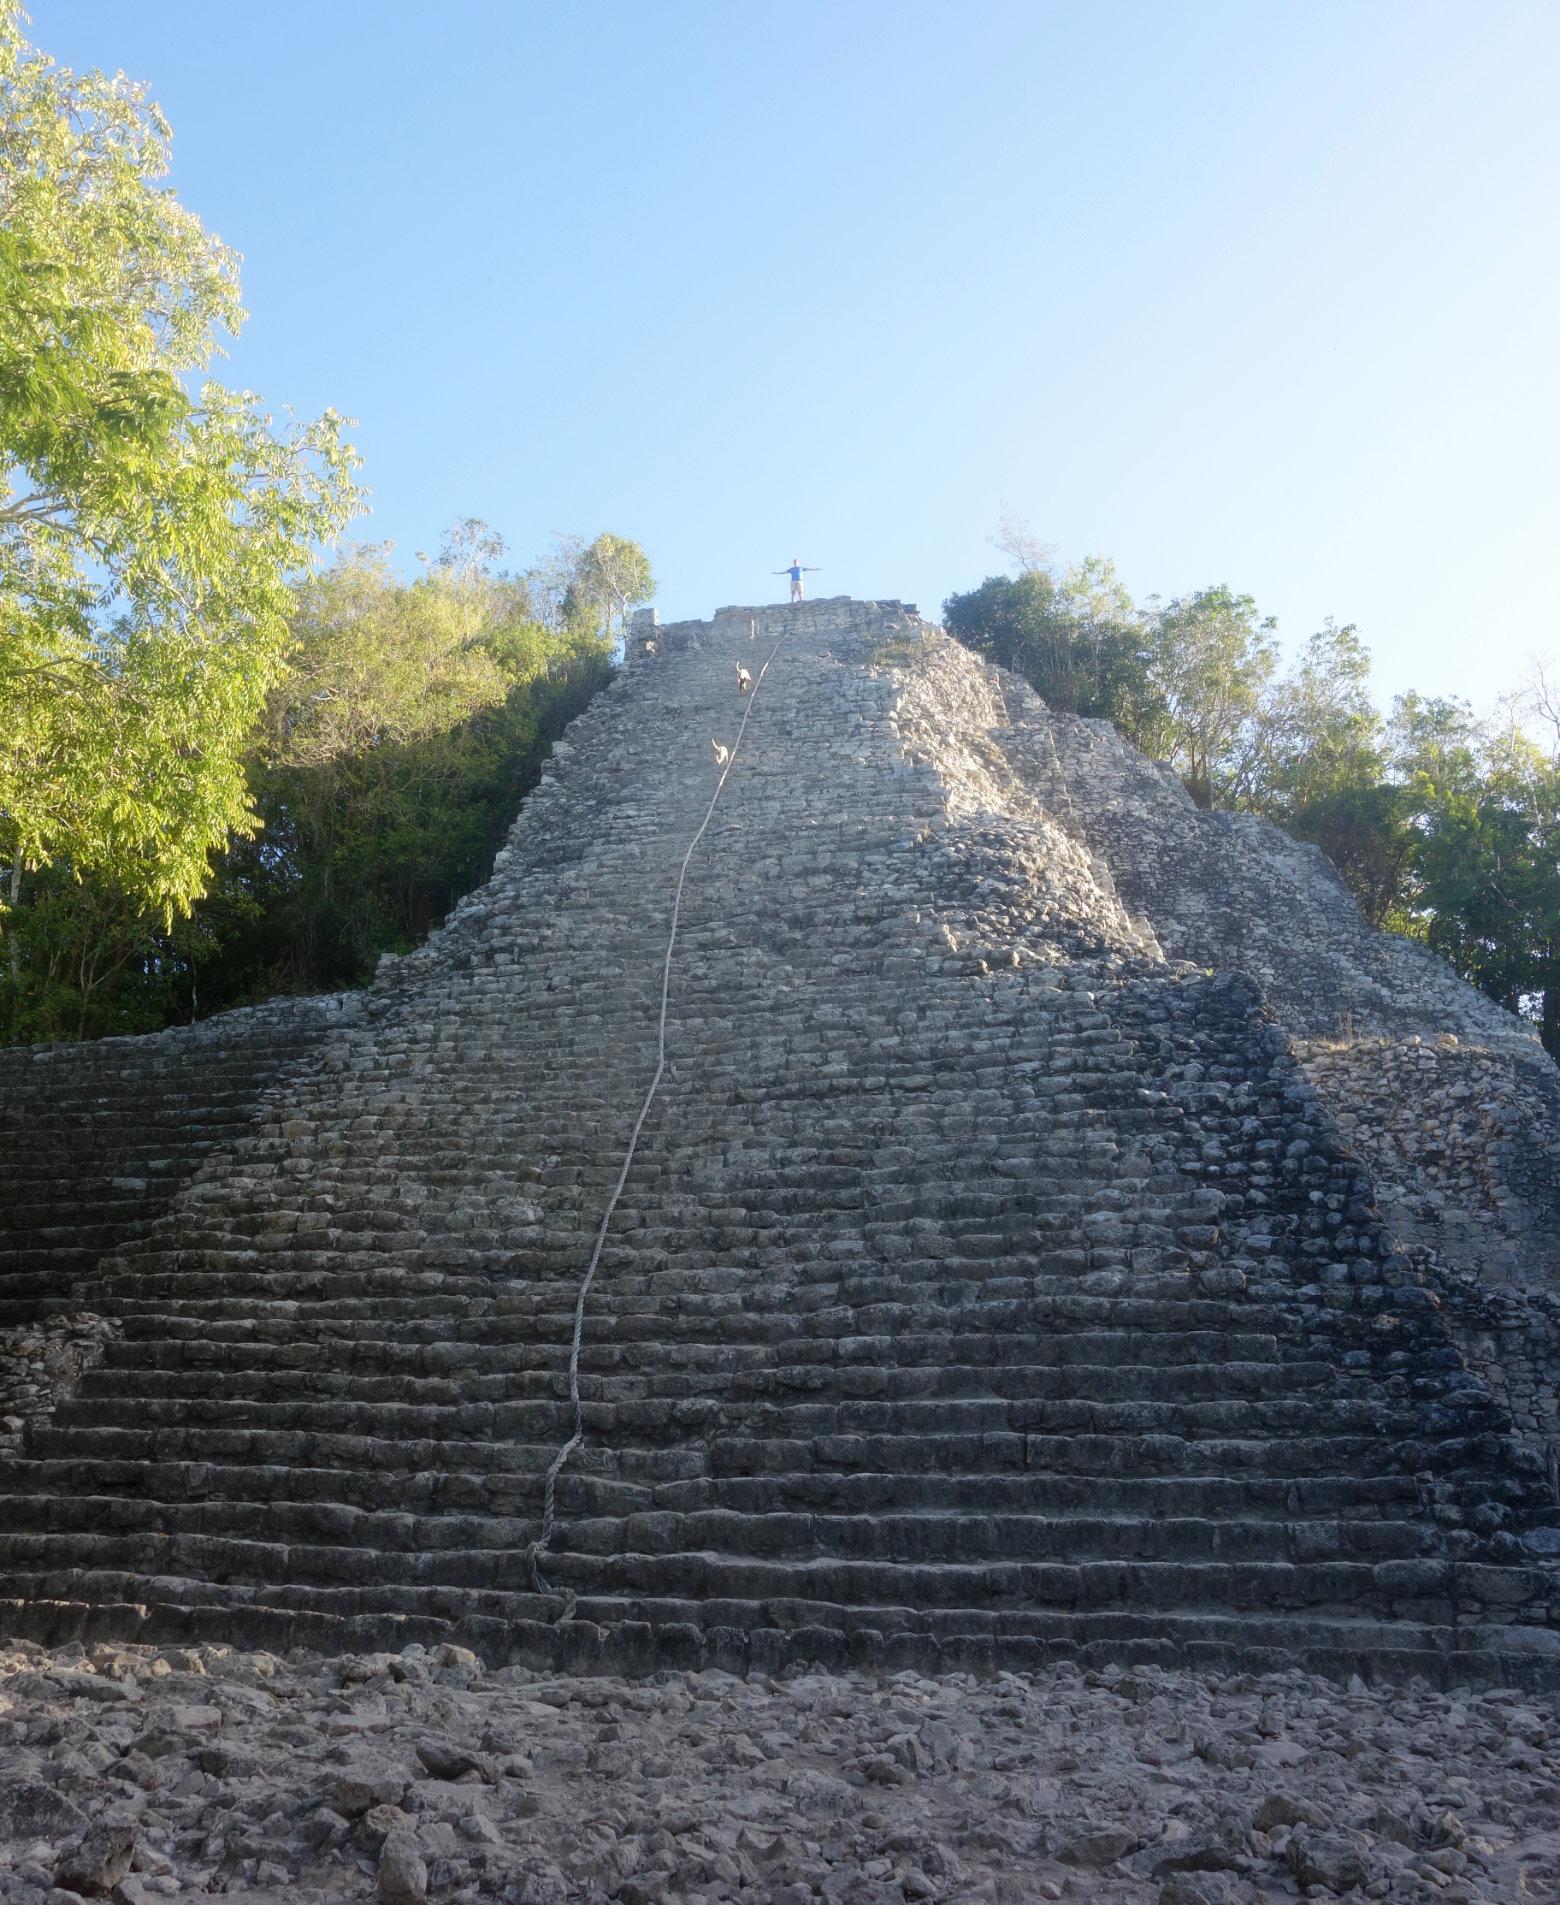 Mexiko Coba Pyramide von unten